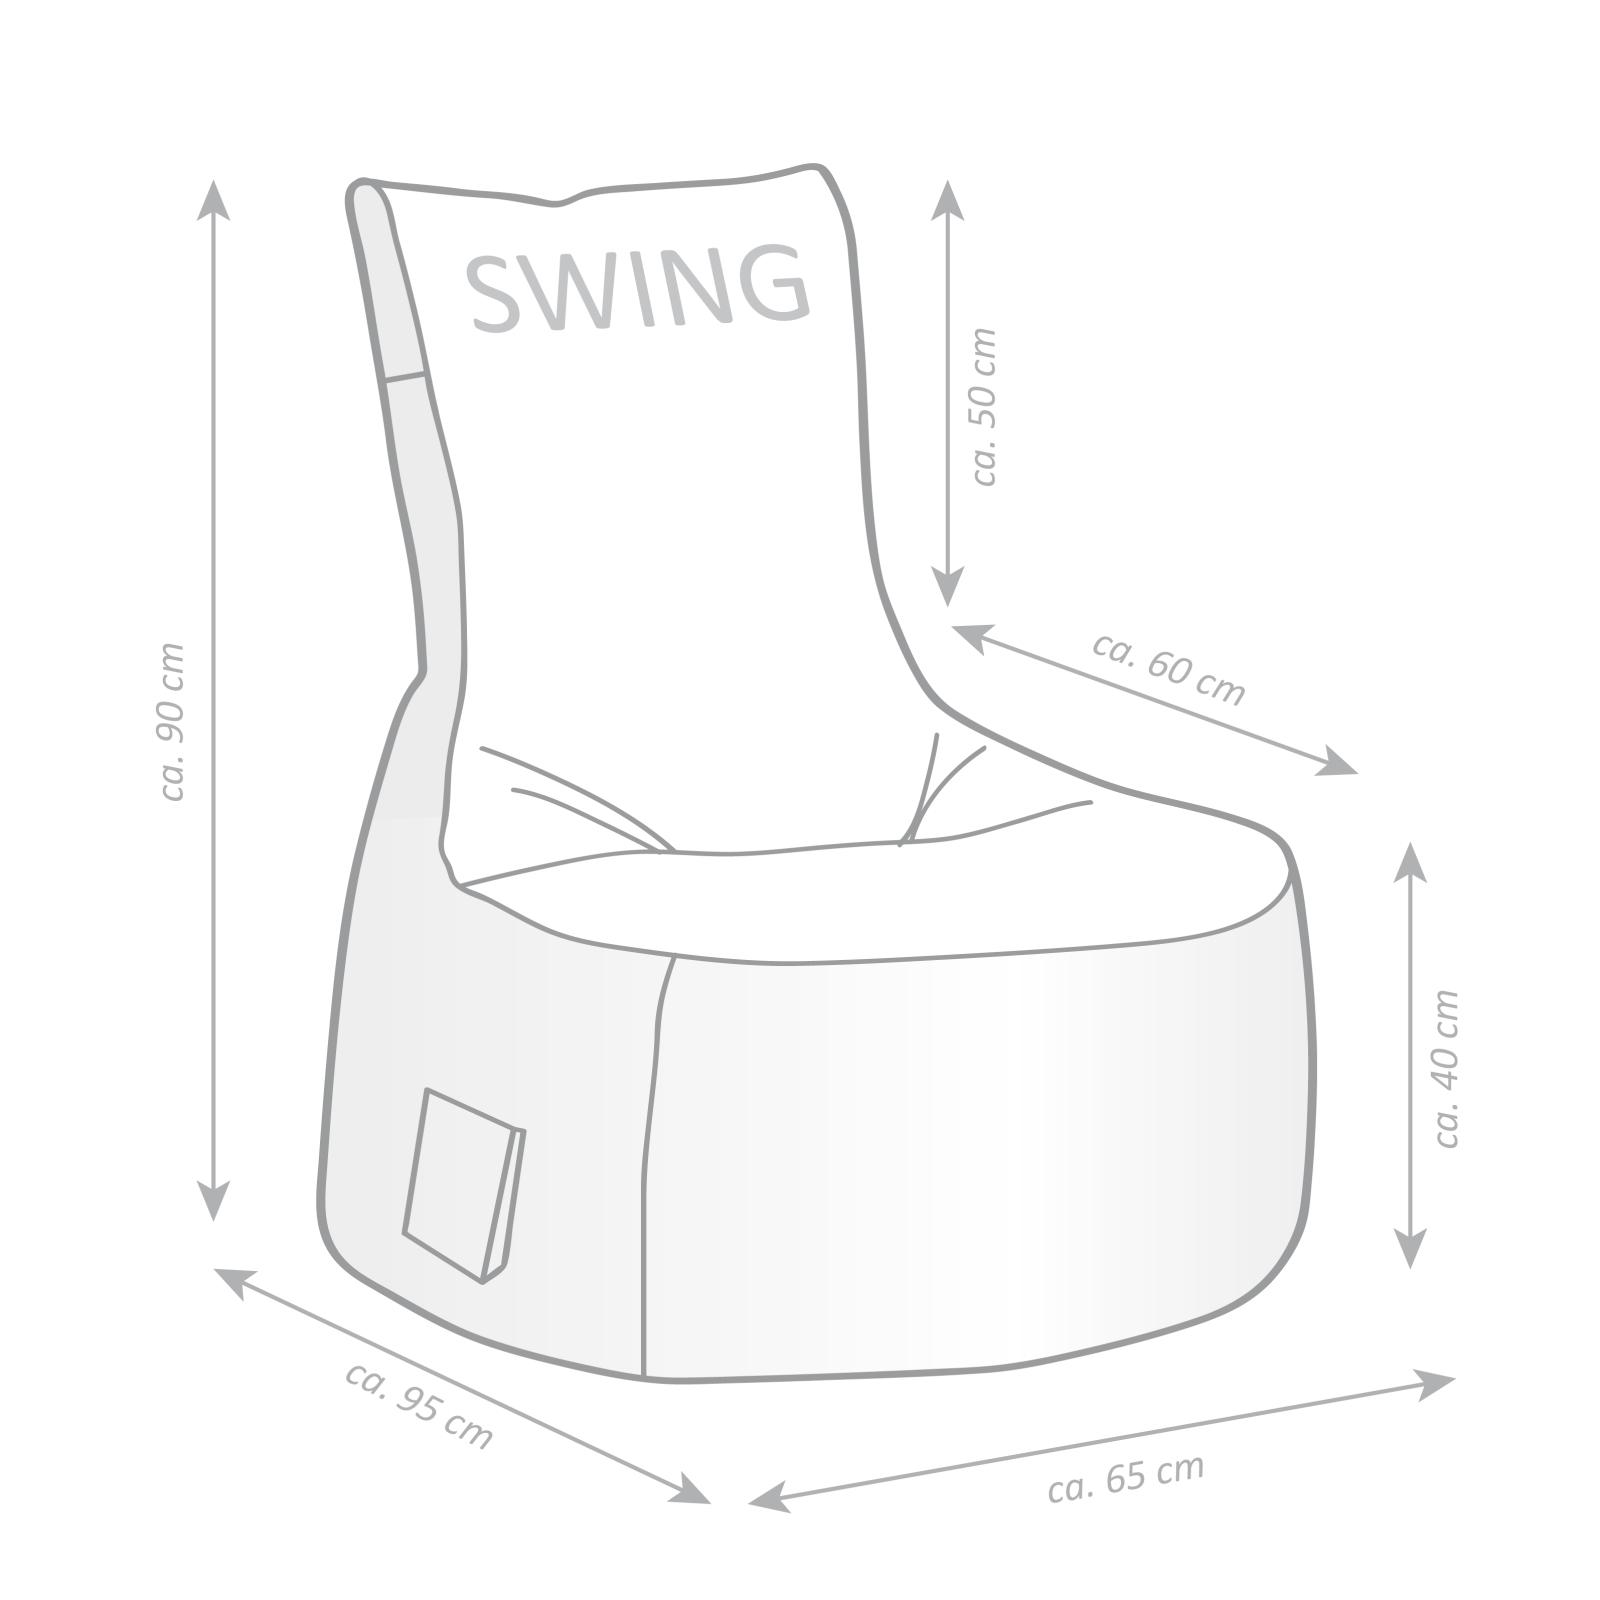 Sitzsack Set Brava Swing Hocker Grün